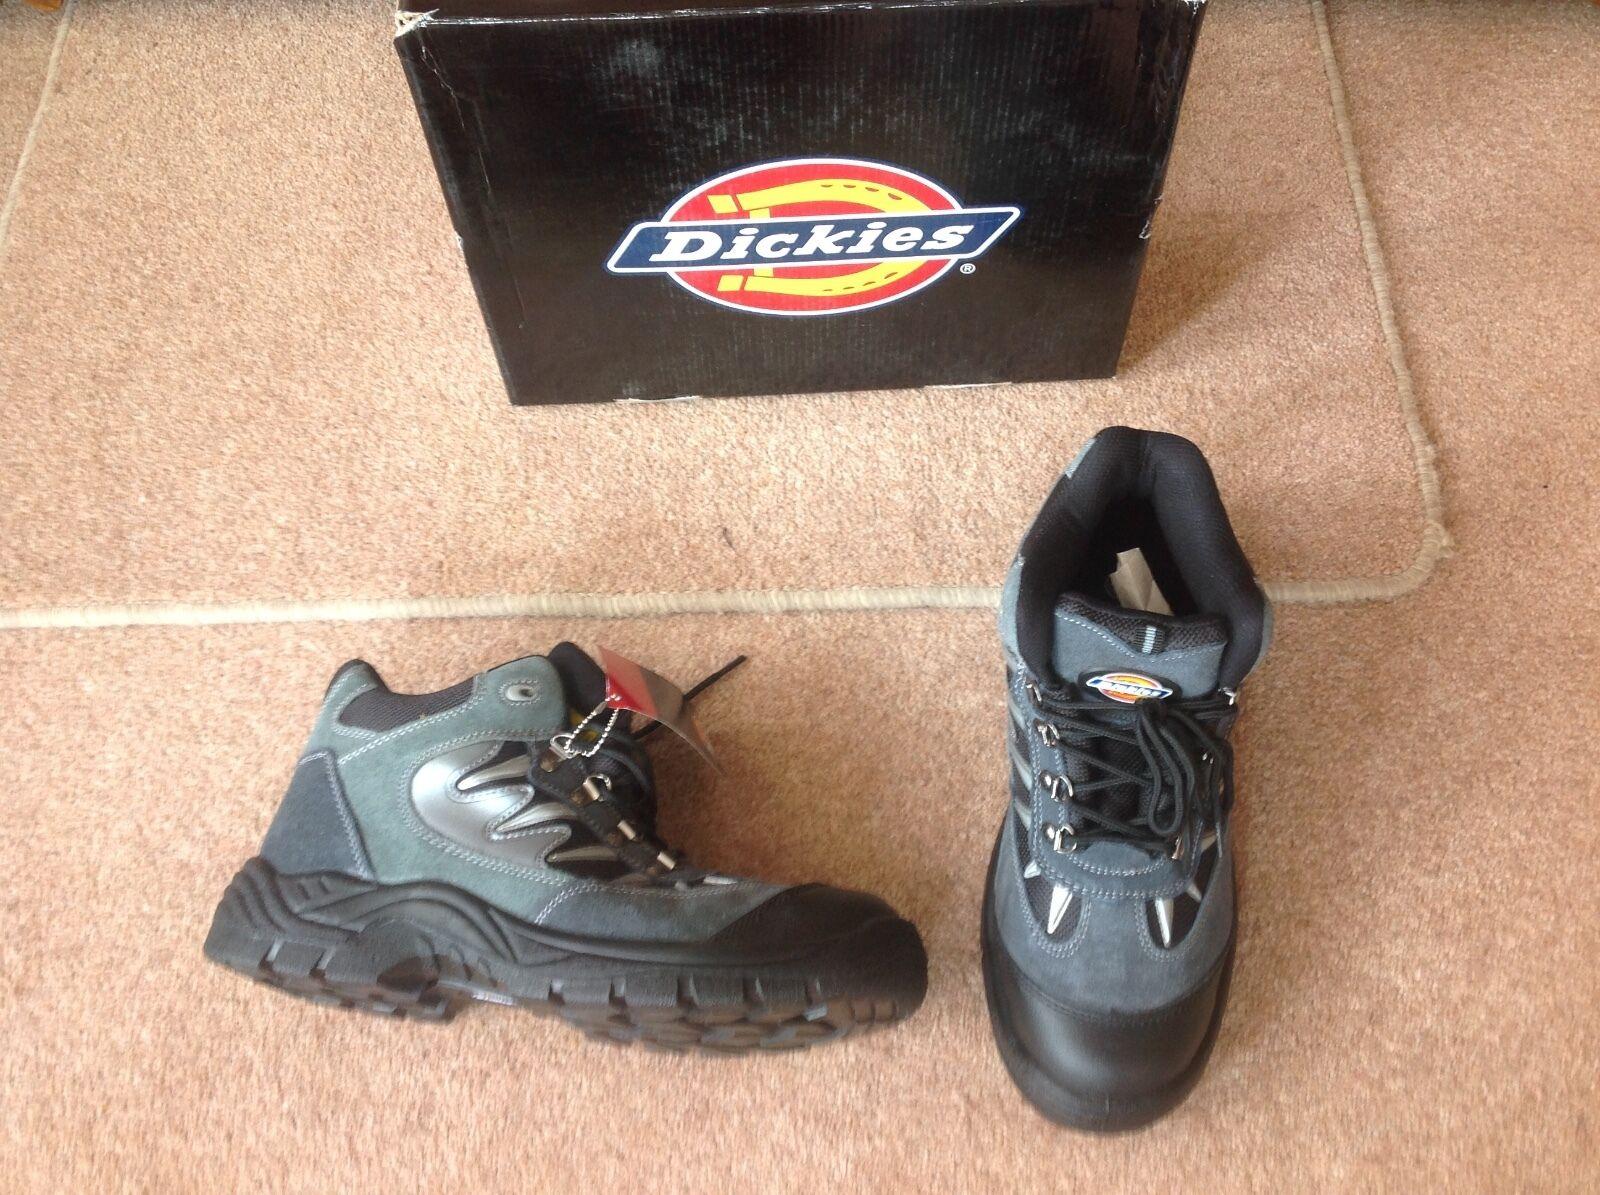 ba73feca0be Dickies Storm Hiker Boot - Grey nrxizs3771-Men's Boots - fashion ...